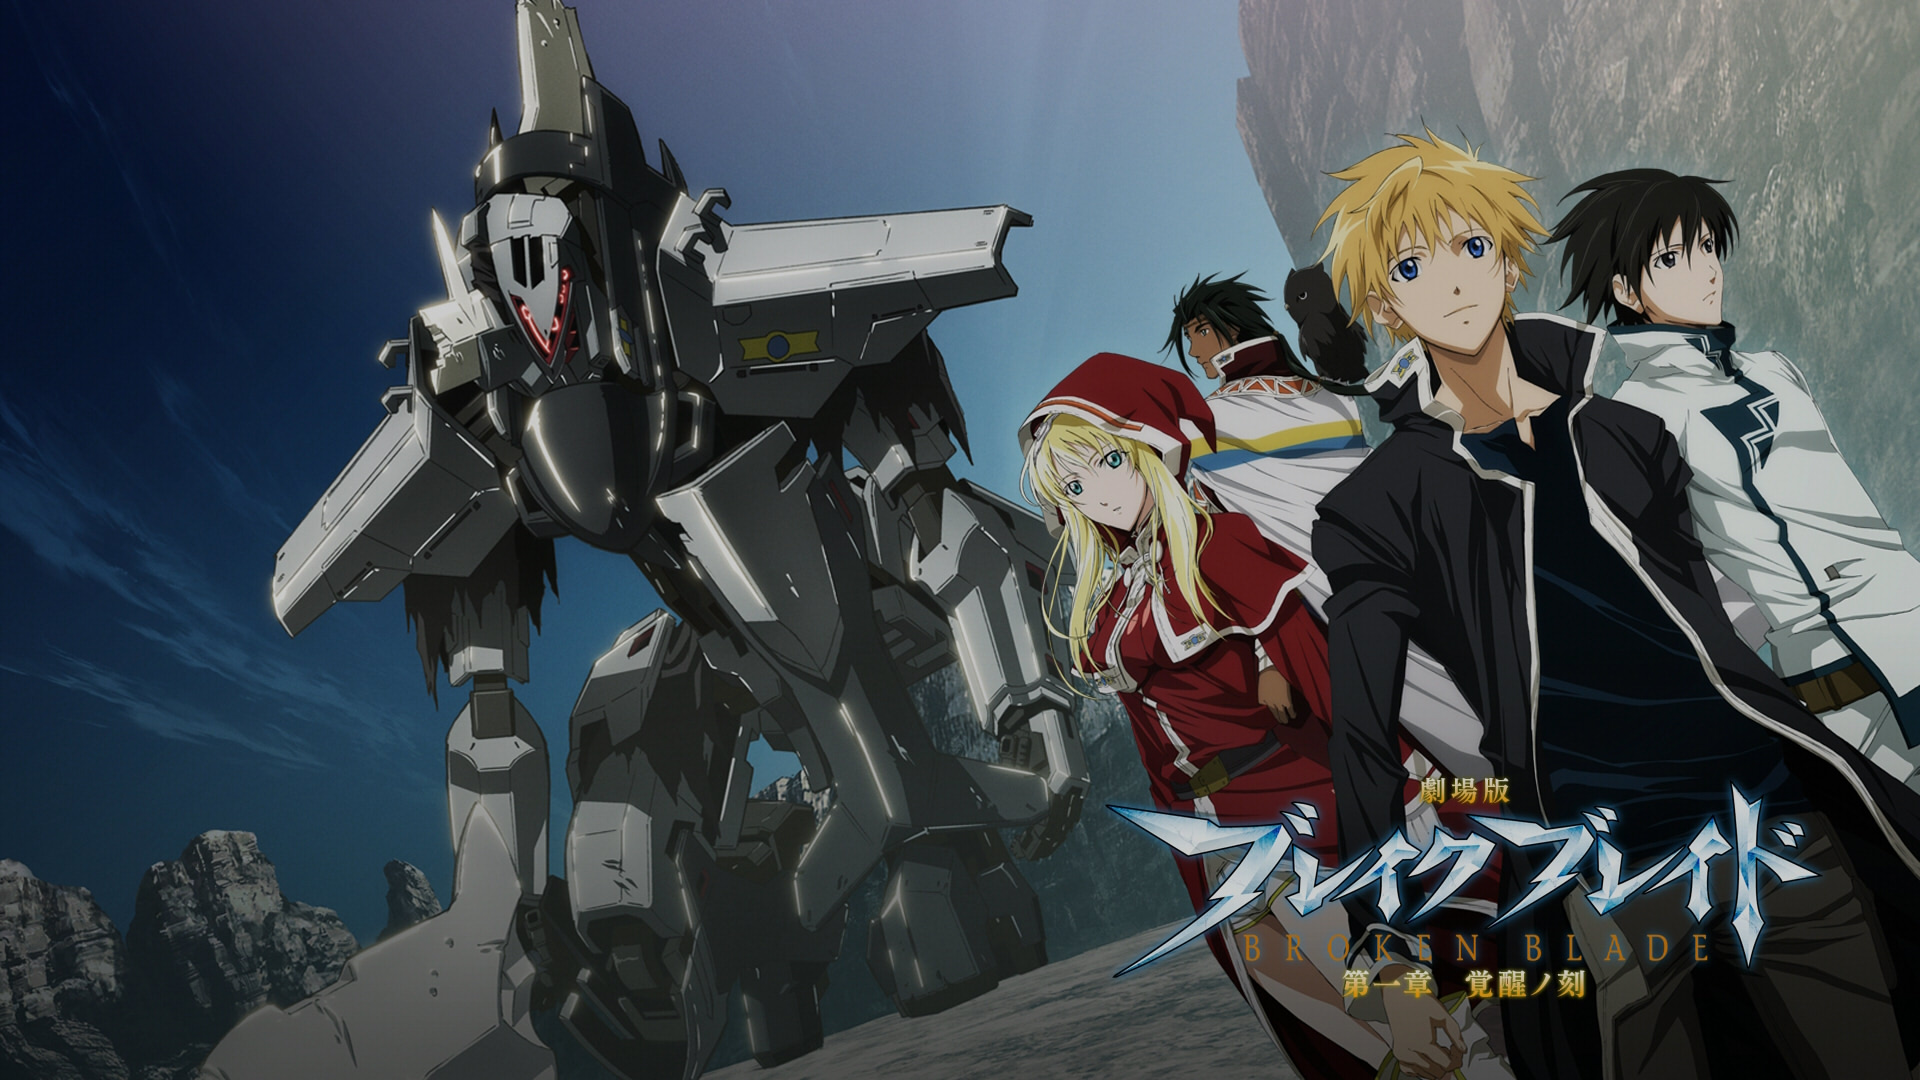 anime_wallpaper_Broken_Blade_1883894.jpg